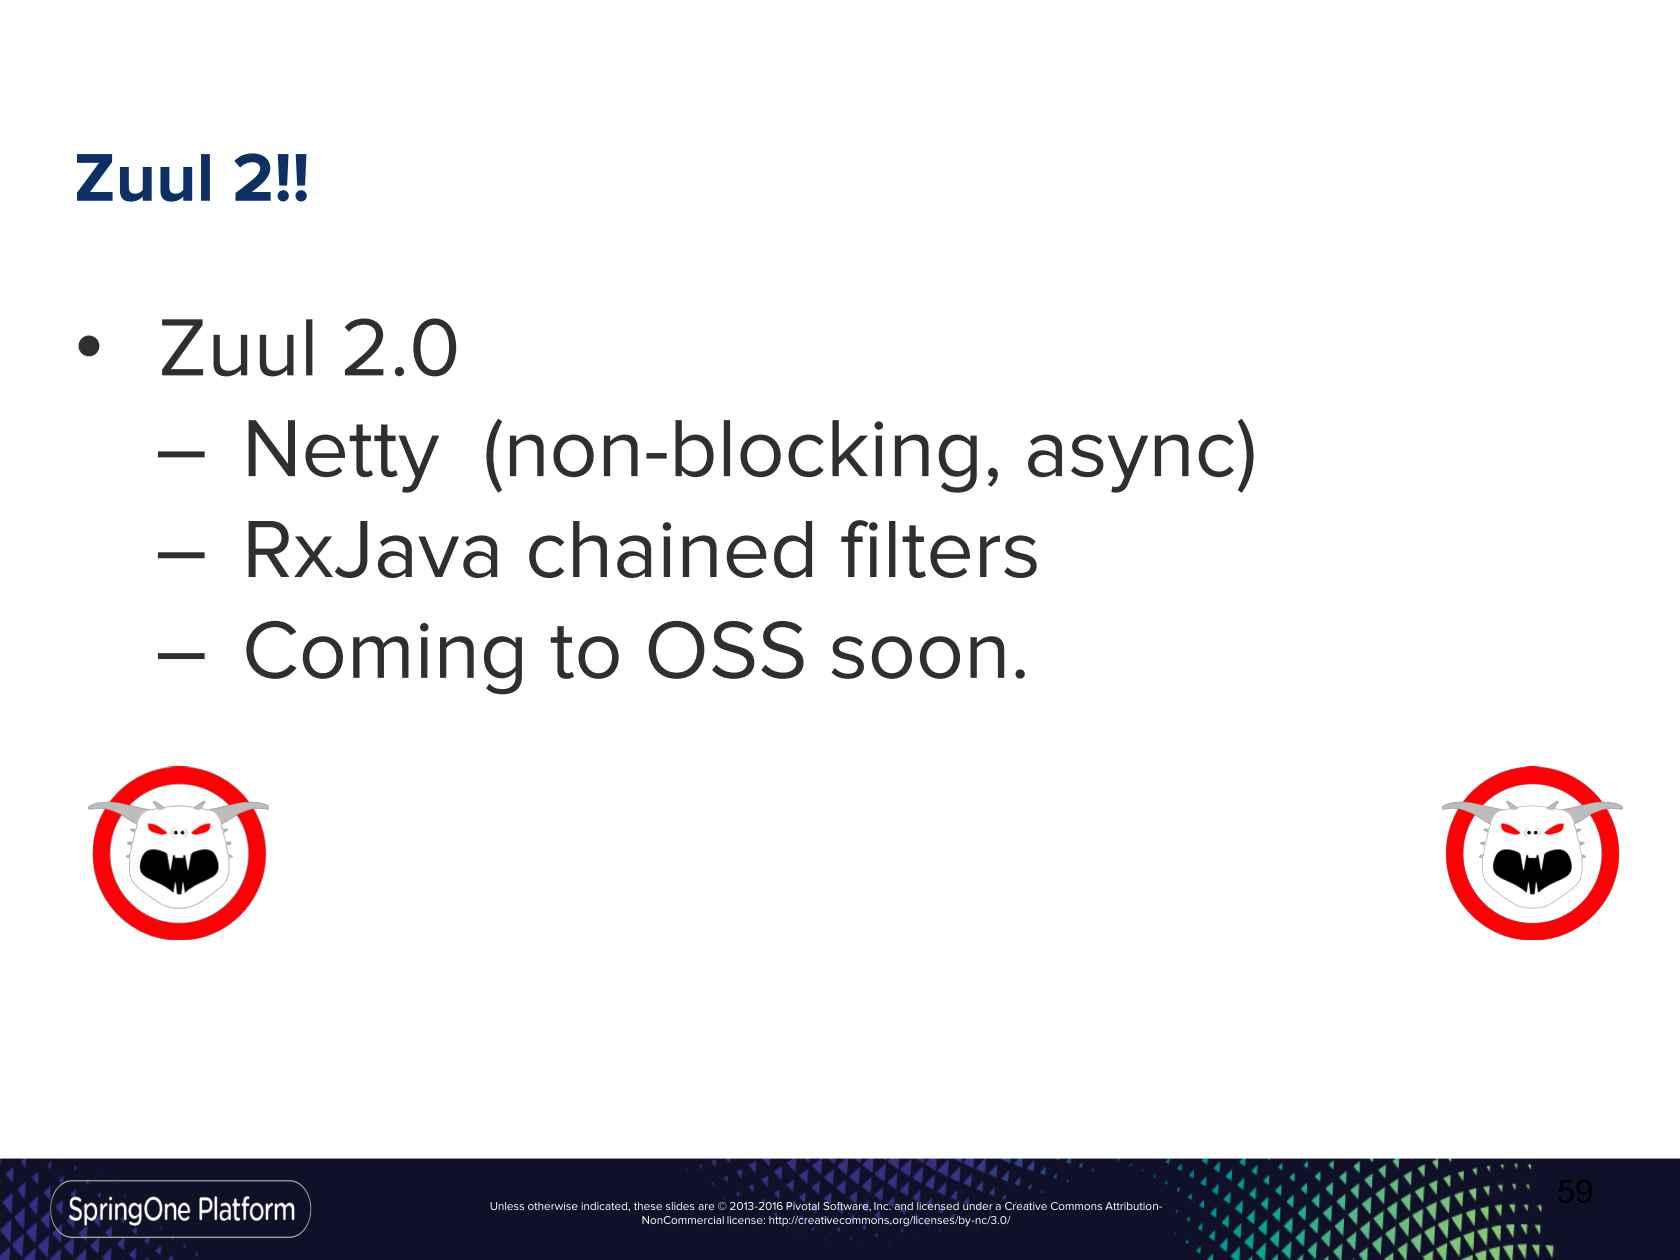 Netflix's Edge Gateway Using Zuul